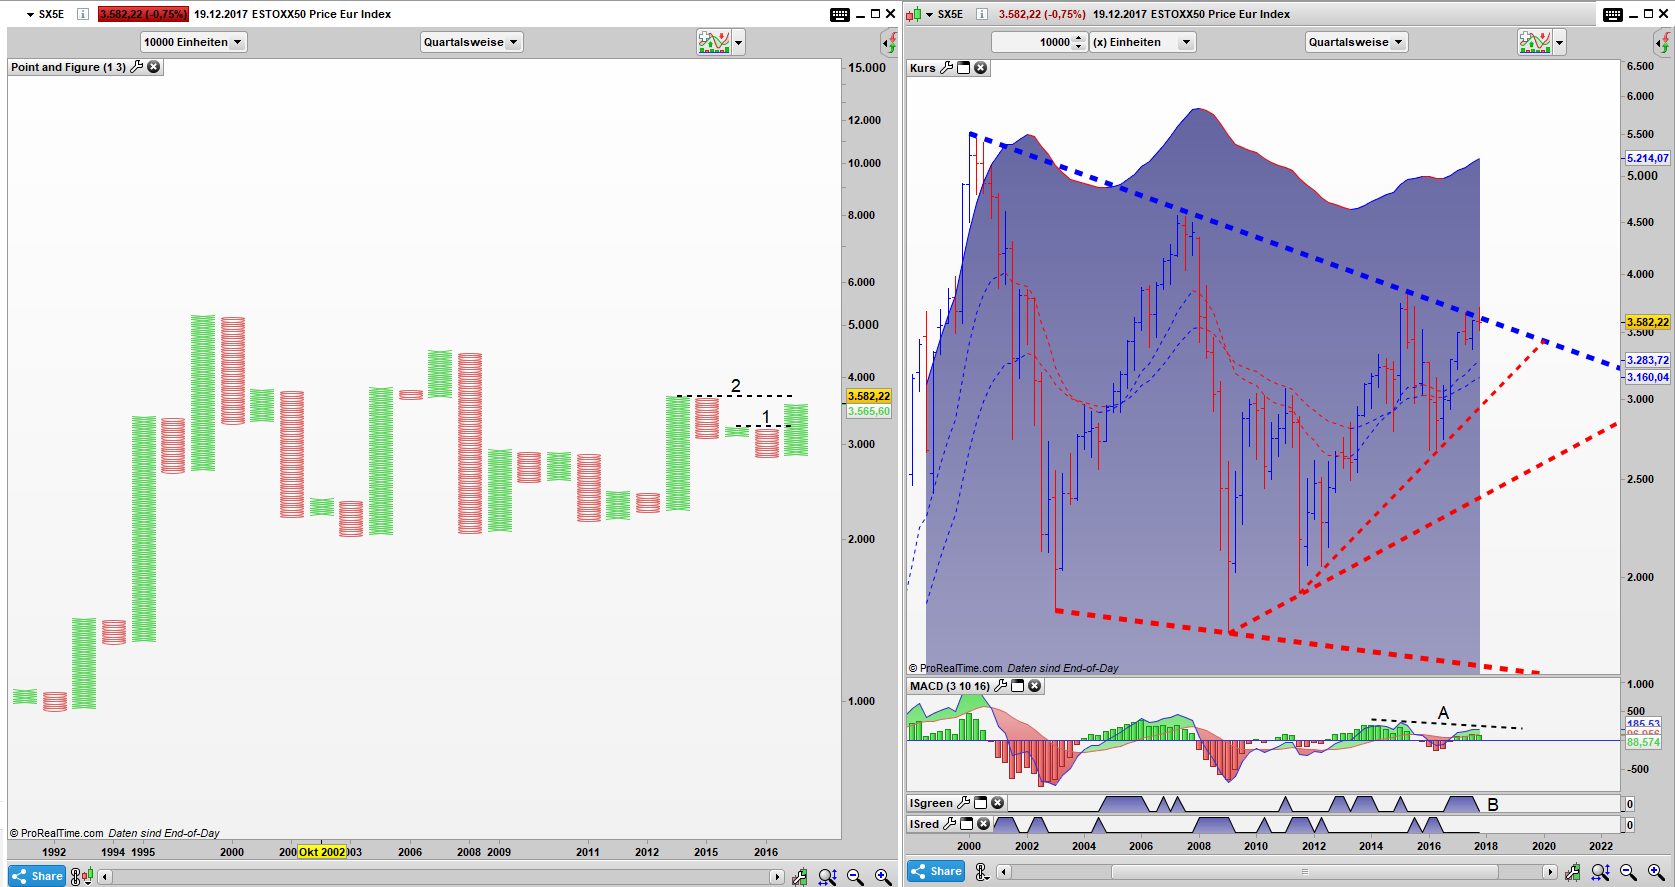 SX5E Point and Figure Quartals Chart, Bar Quartals Chart: Ausbruch misslang und eine Bear Div entstand